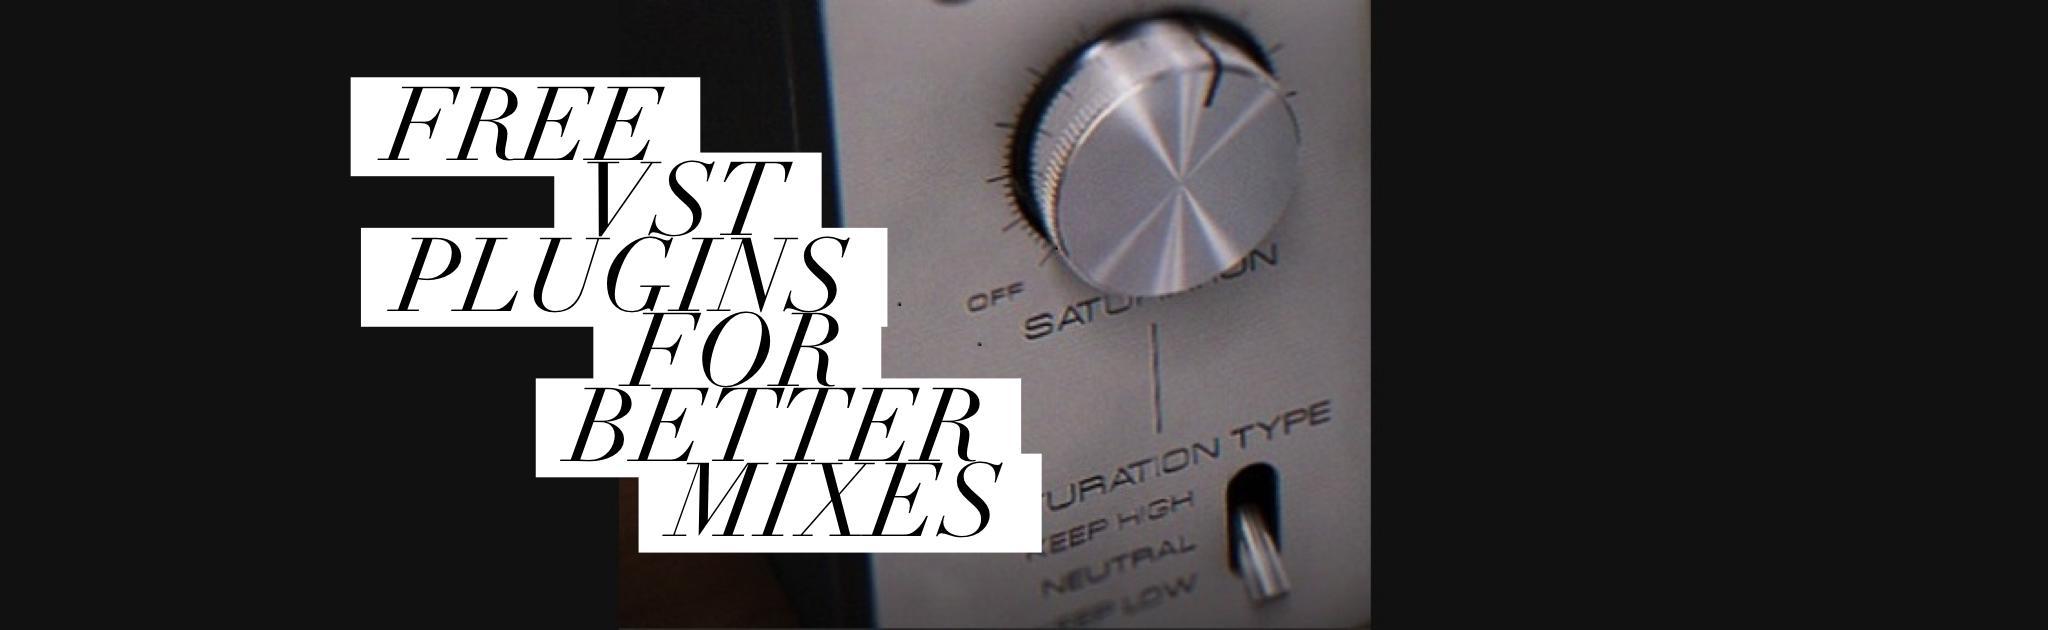 FREE VST Plugins For Better Mixes - SuperHeroSamples